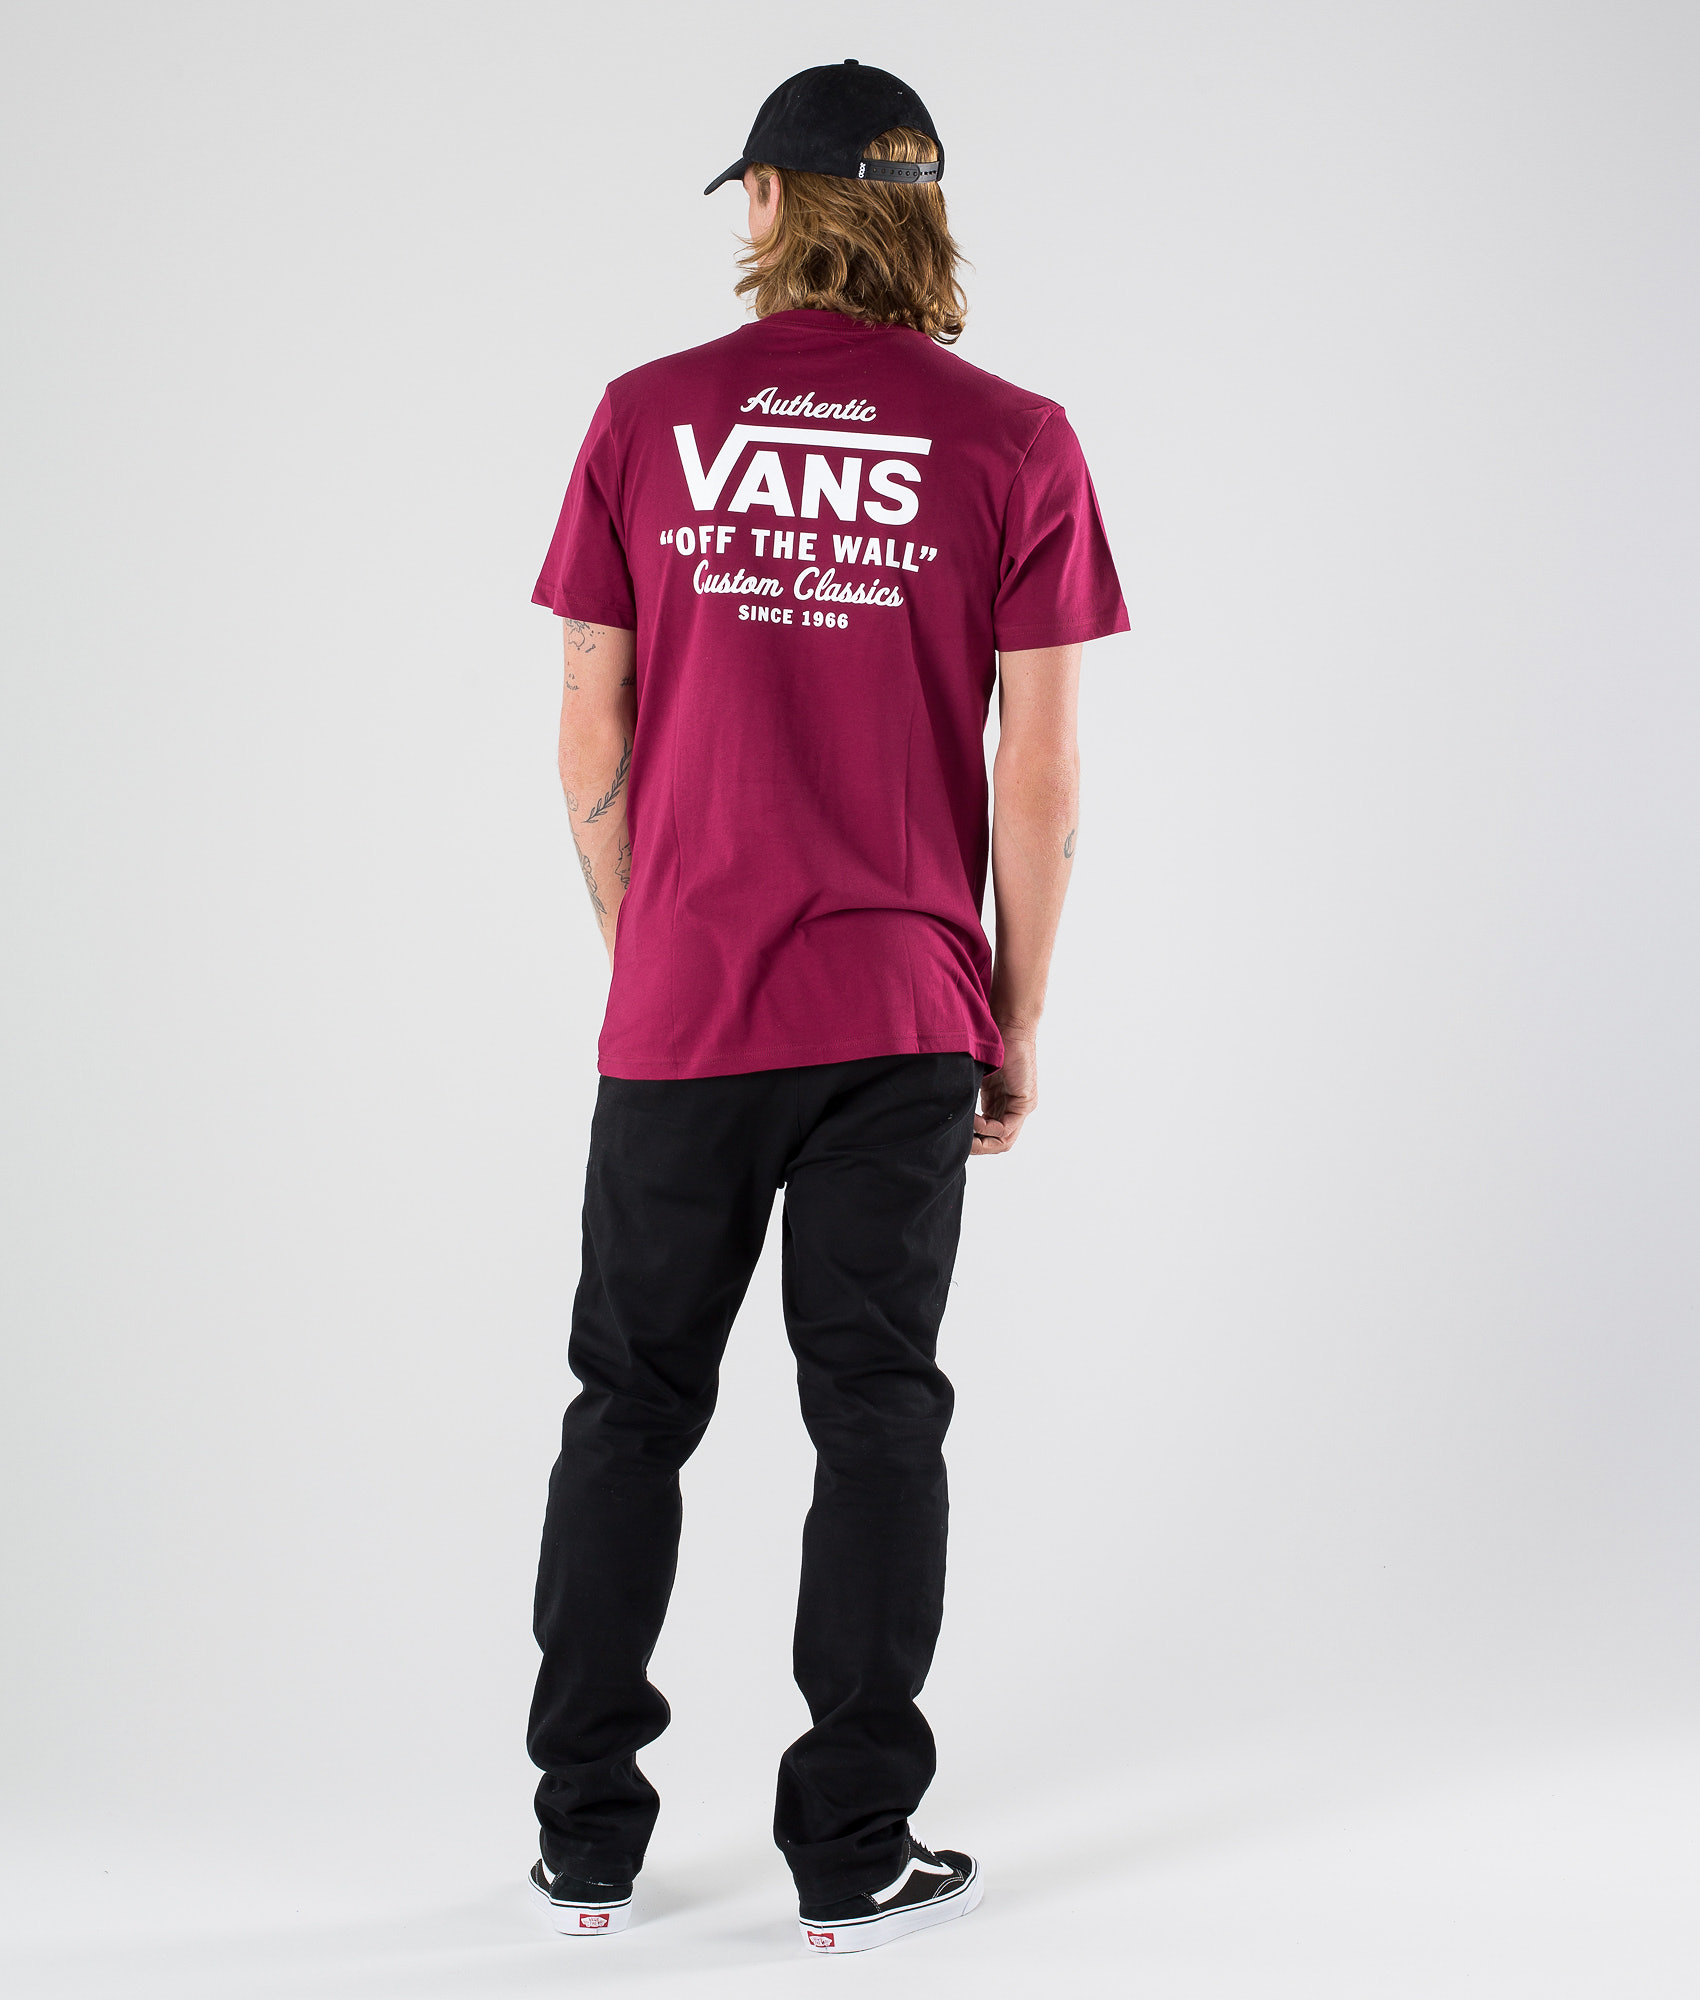 Vans Holder Street II T-shirt Rhumba Red White - Ridestore.com 161d452412